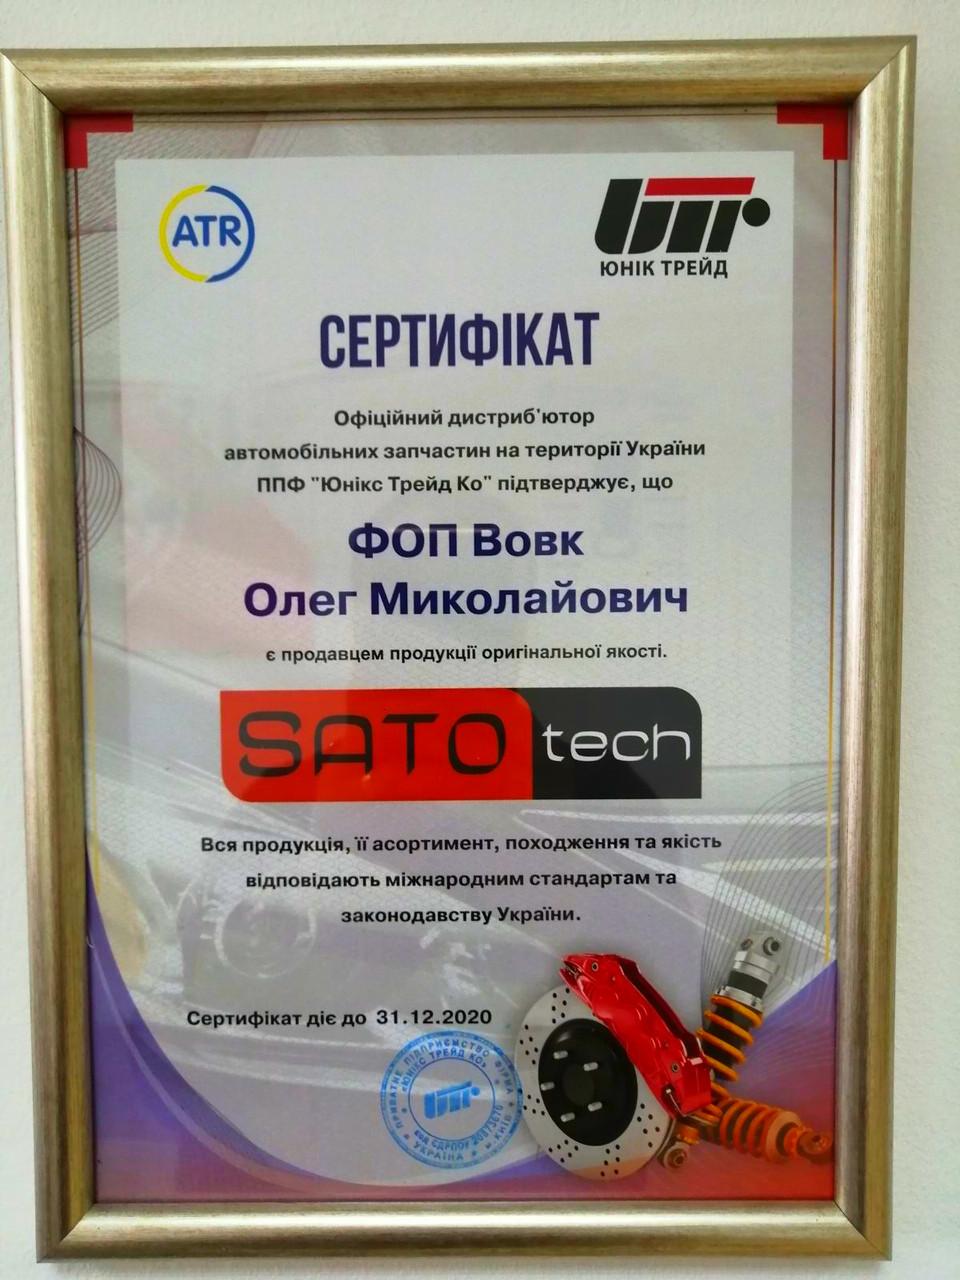 SATO Амортизатор Mitsubishi Carisma 95-